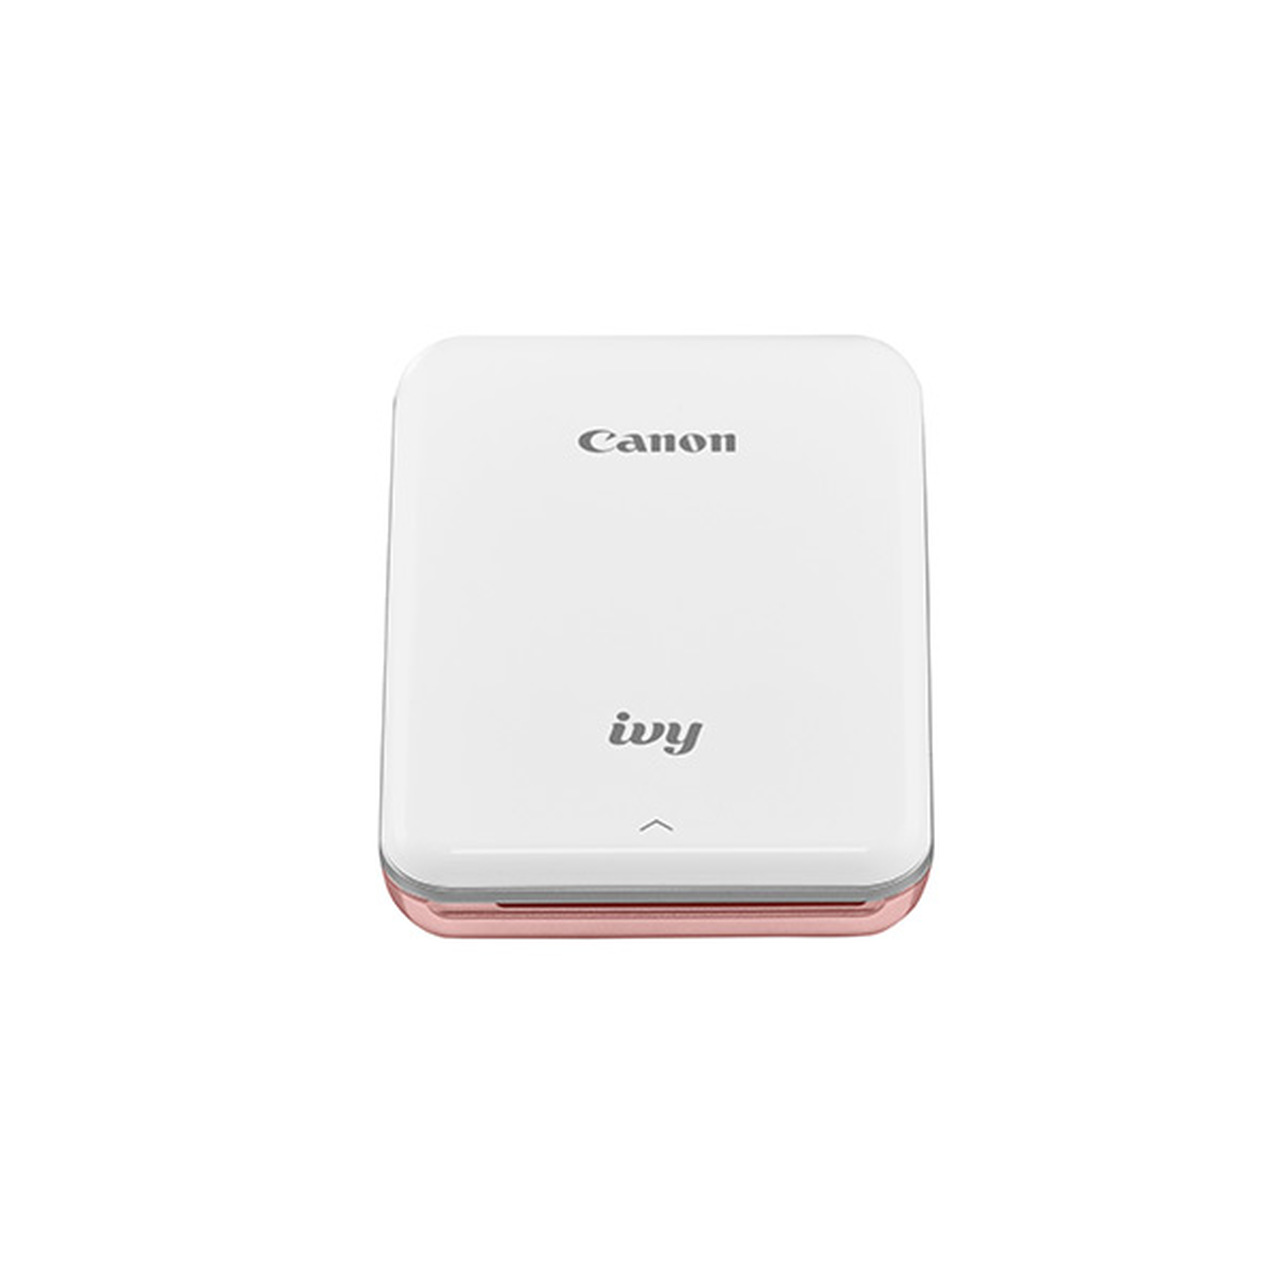 Canon Ivy 2x3 Printer Rose Gold